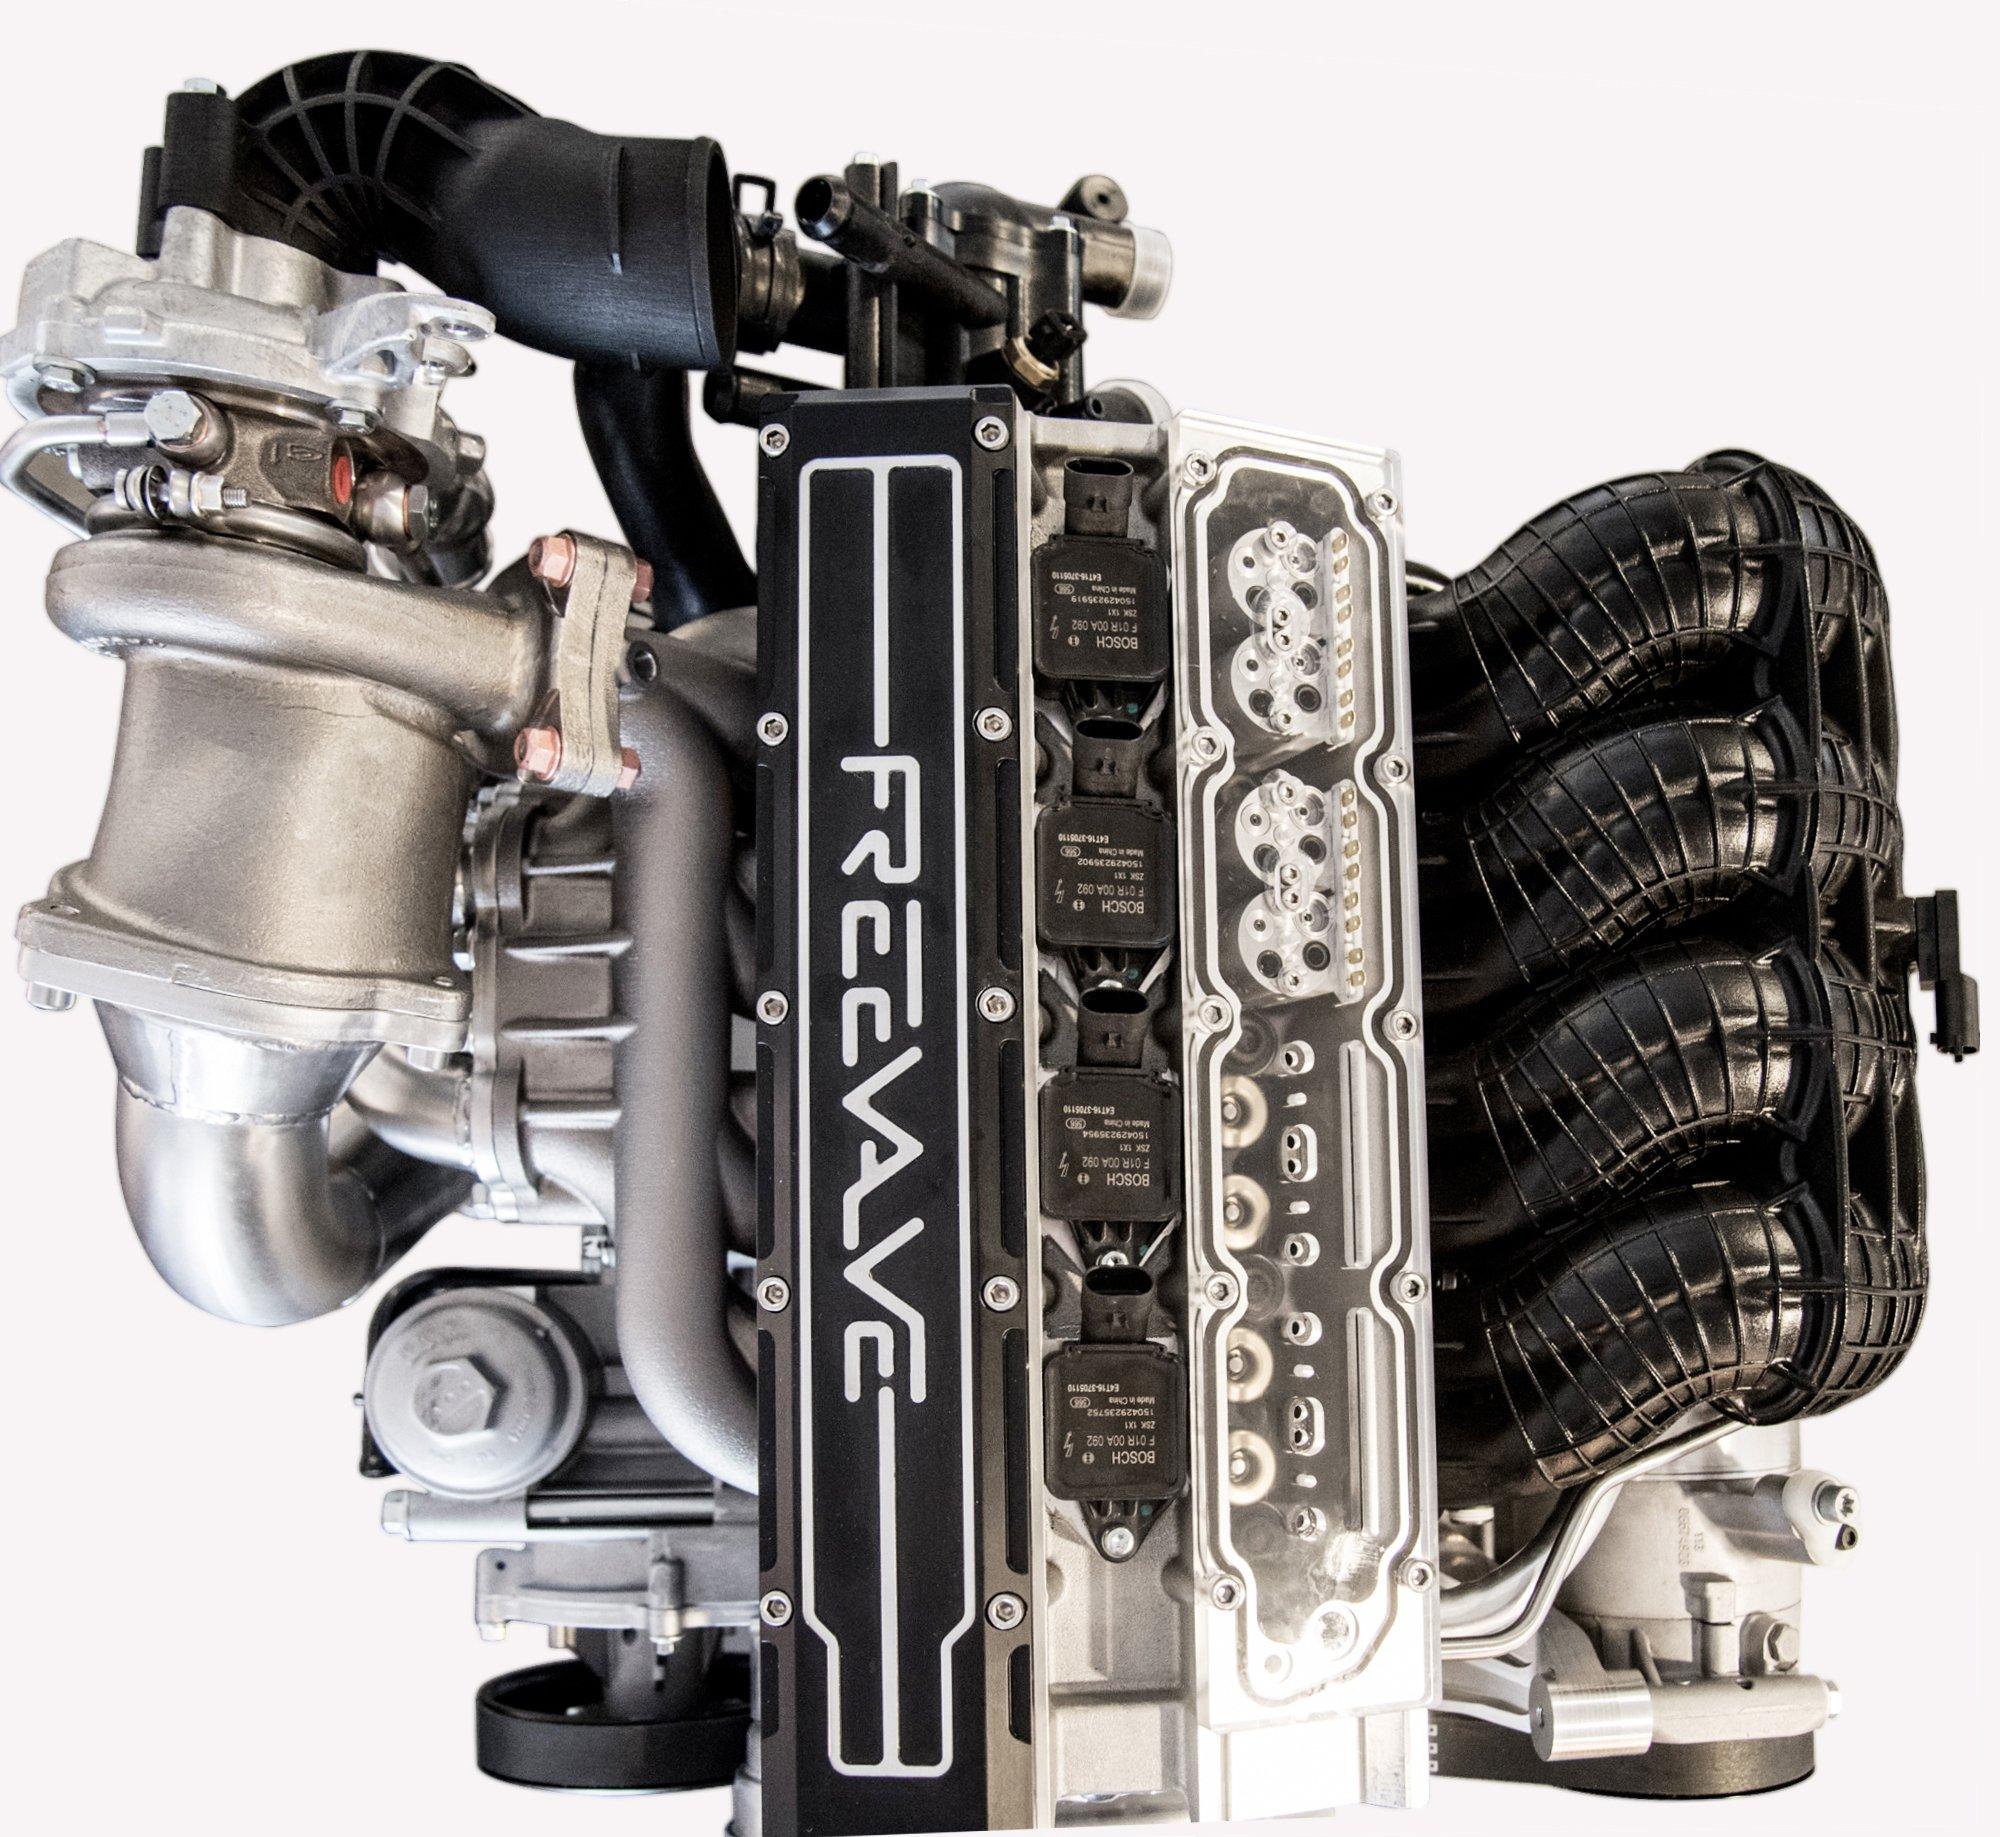 Koenigsegg S Freevalve Camless Engine Set For Debut